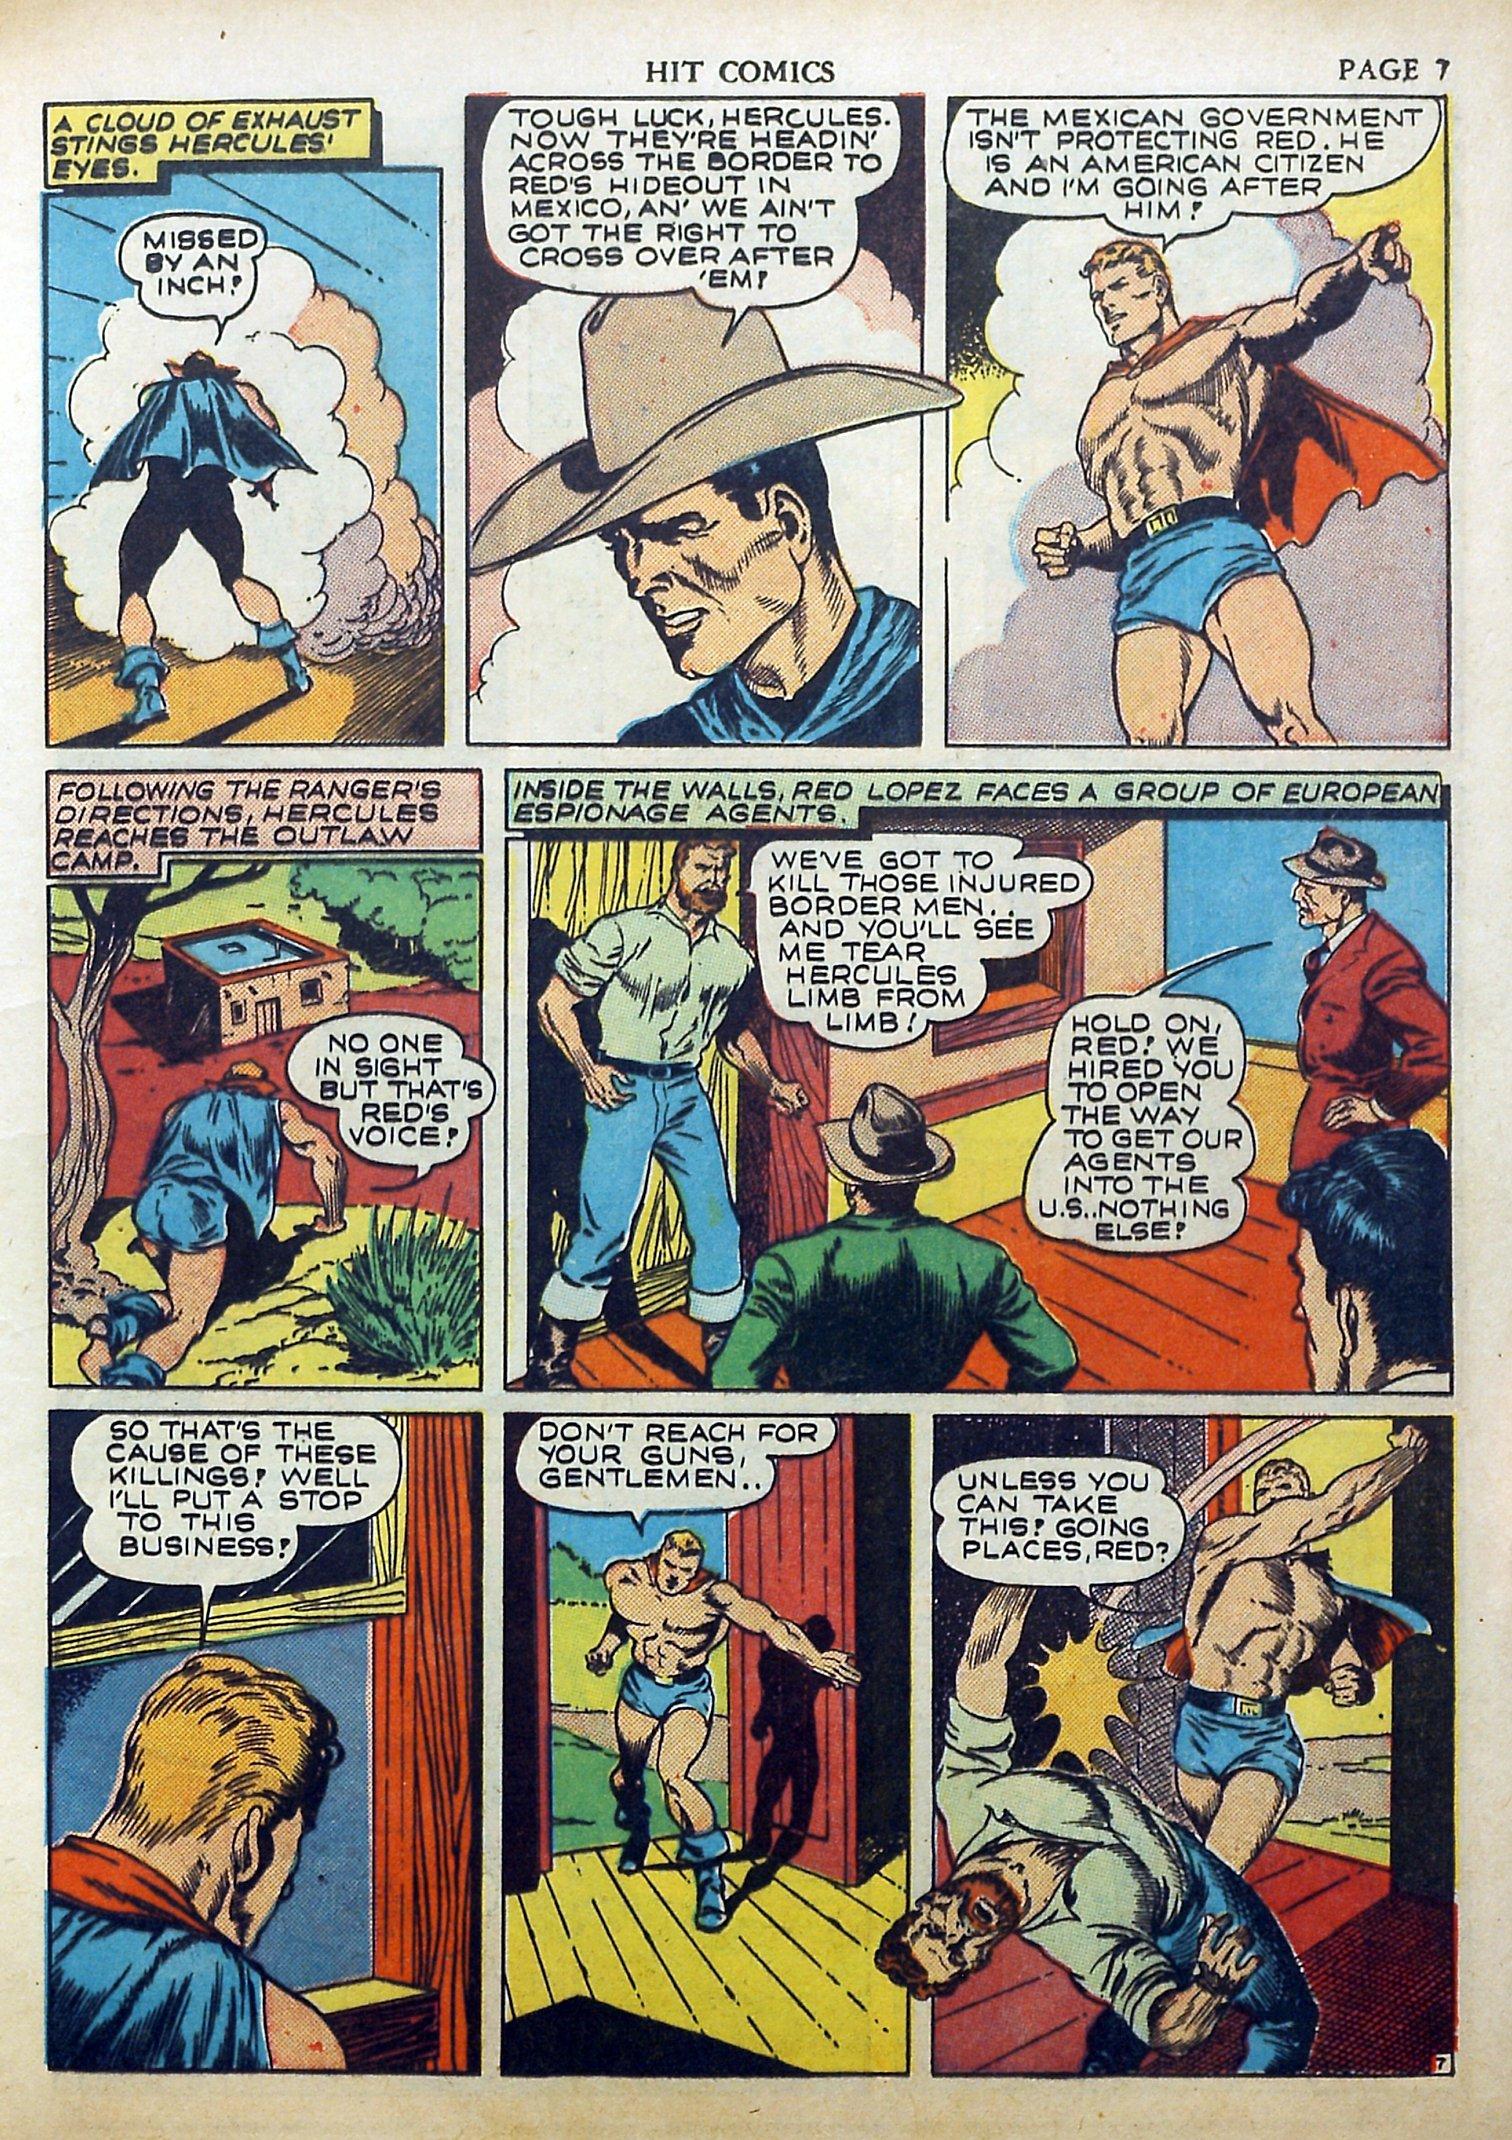 Read online Hit Comics comic -  Issue #17 - 9